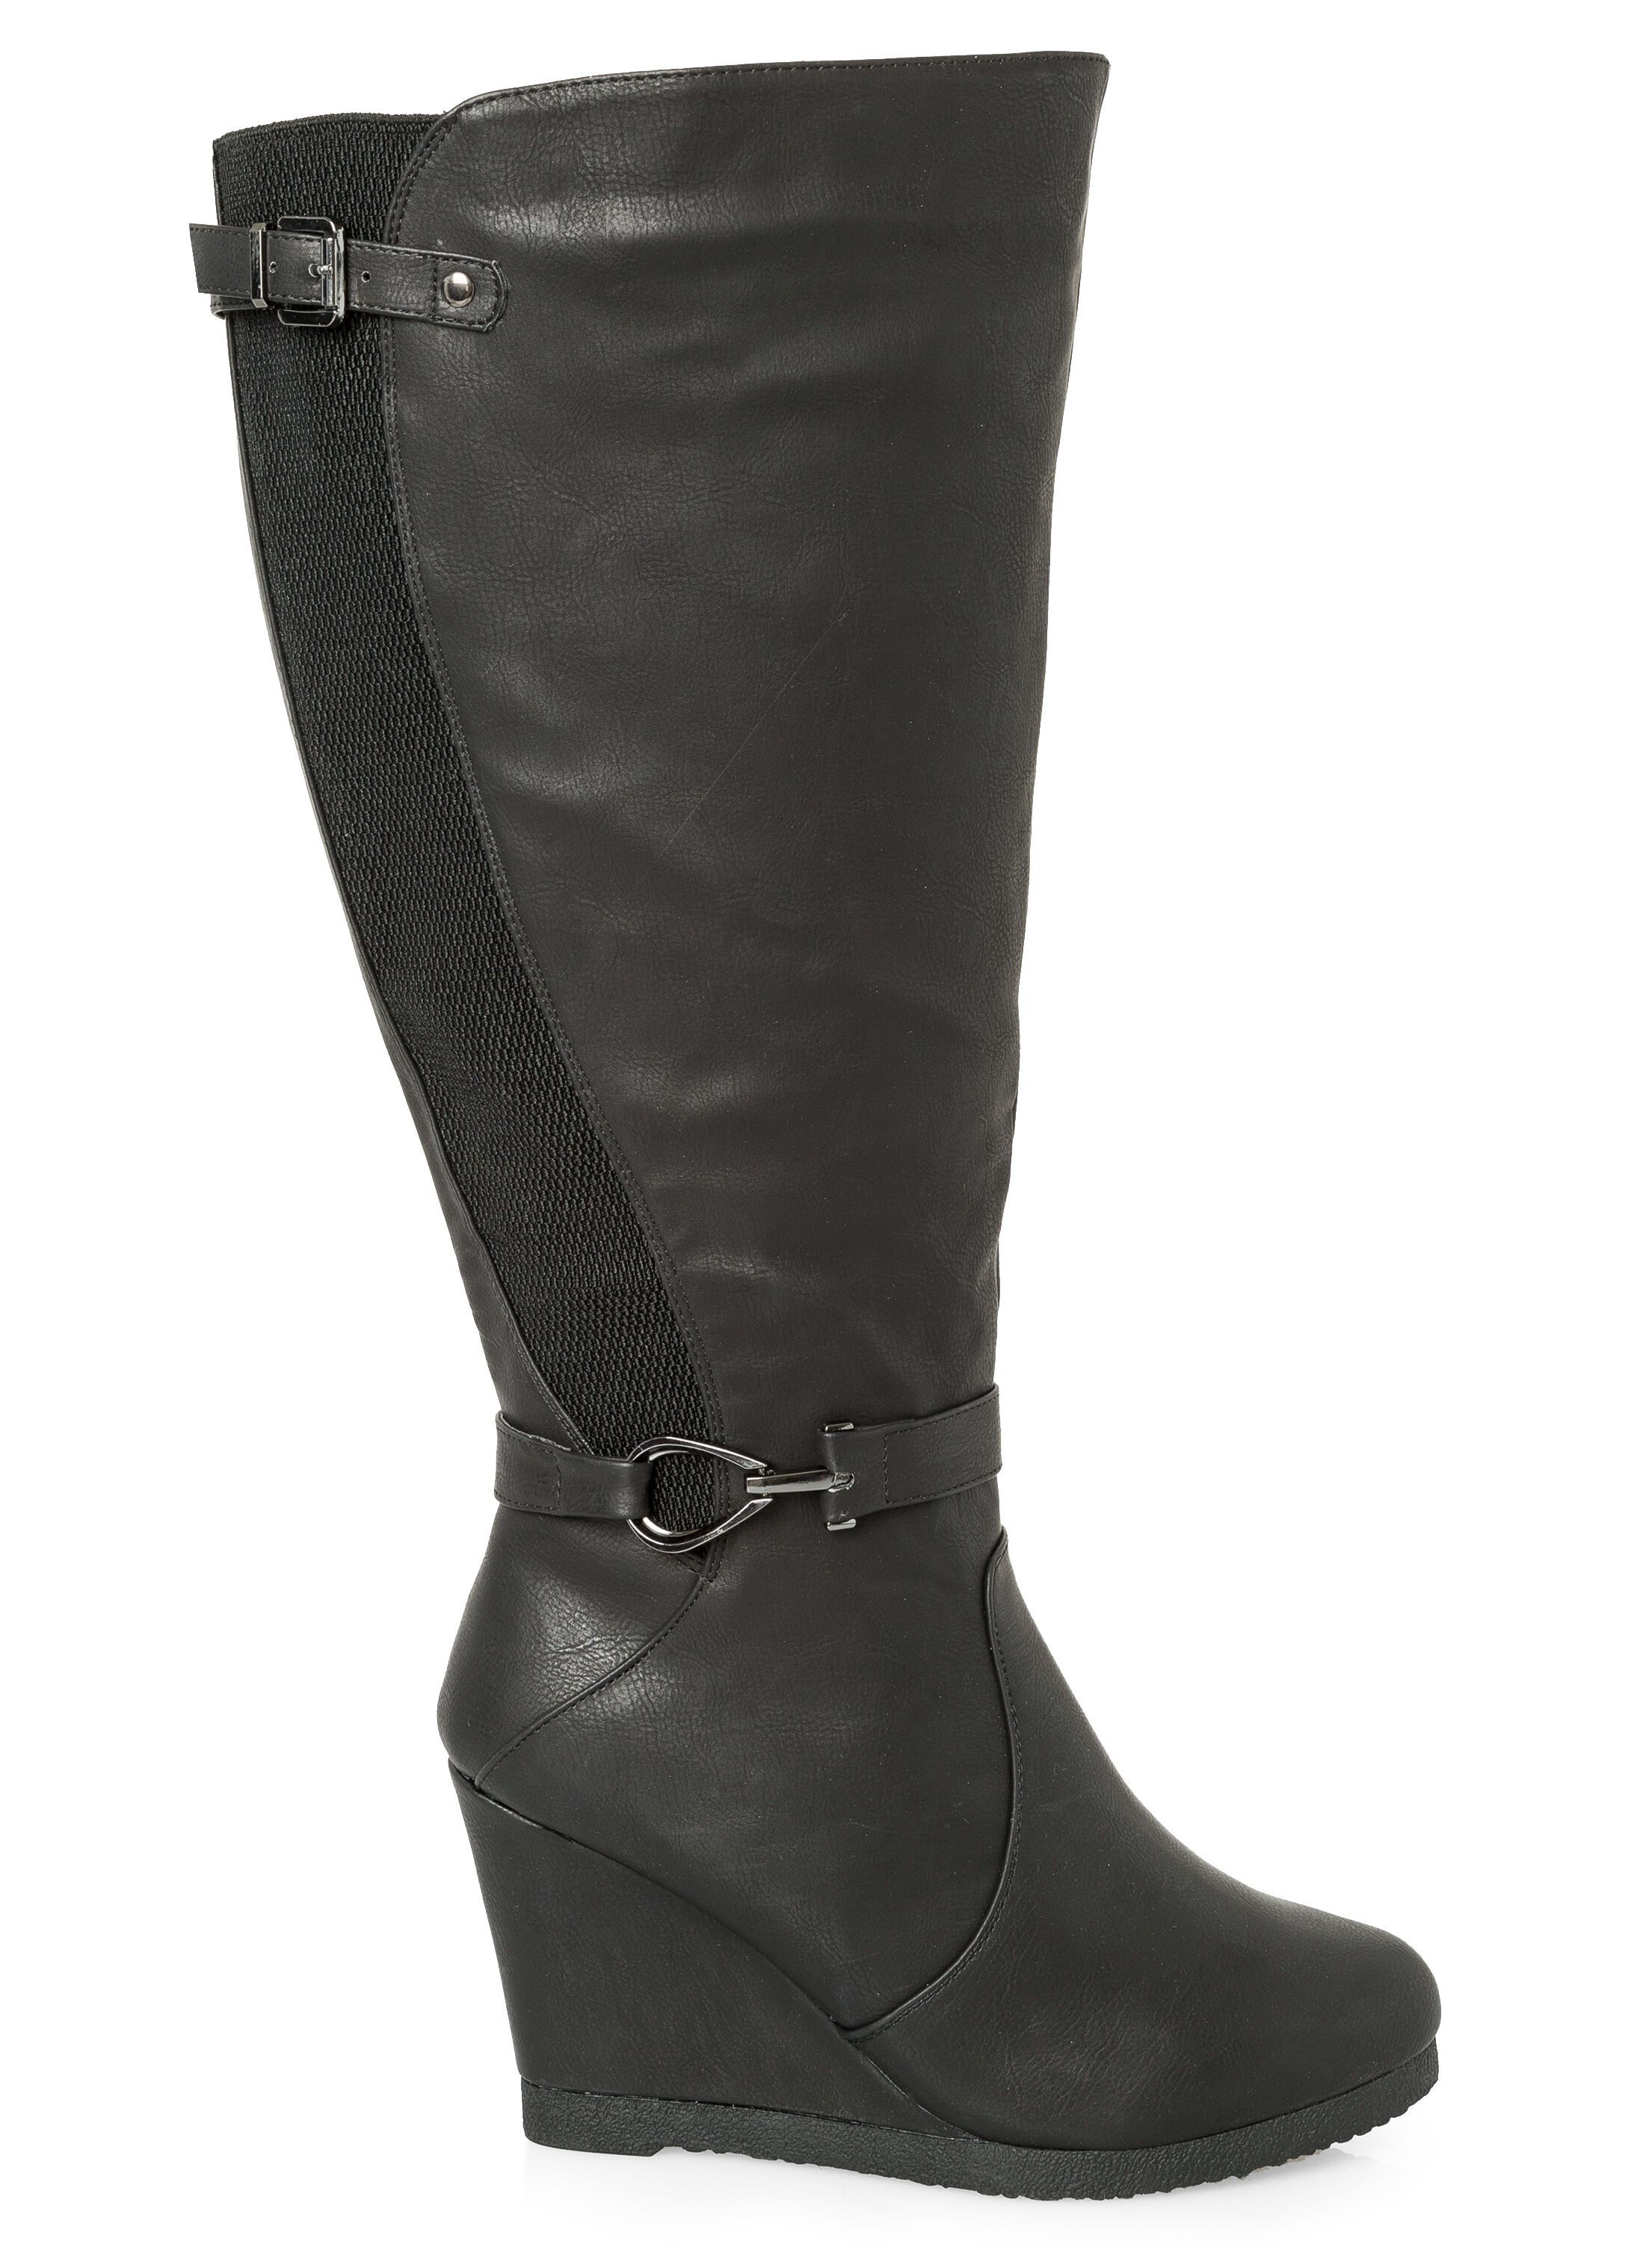 Tall Wedge Boot - Wide Calf, Wide Width